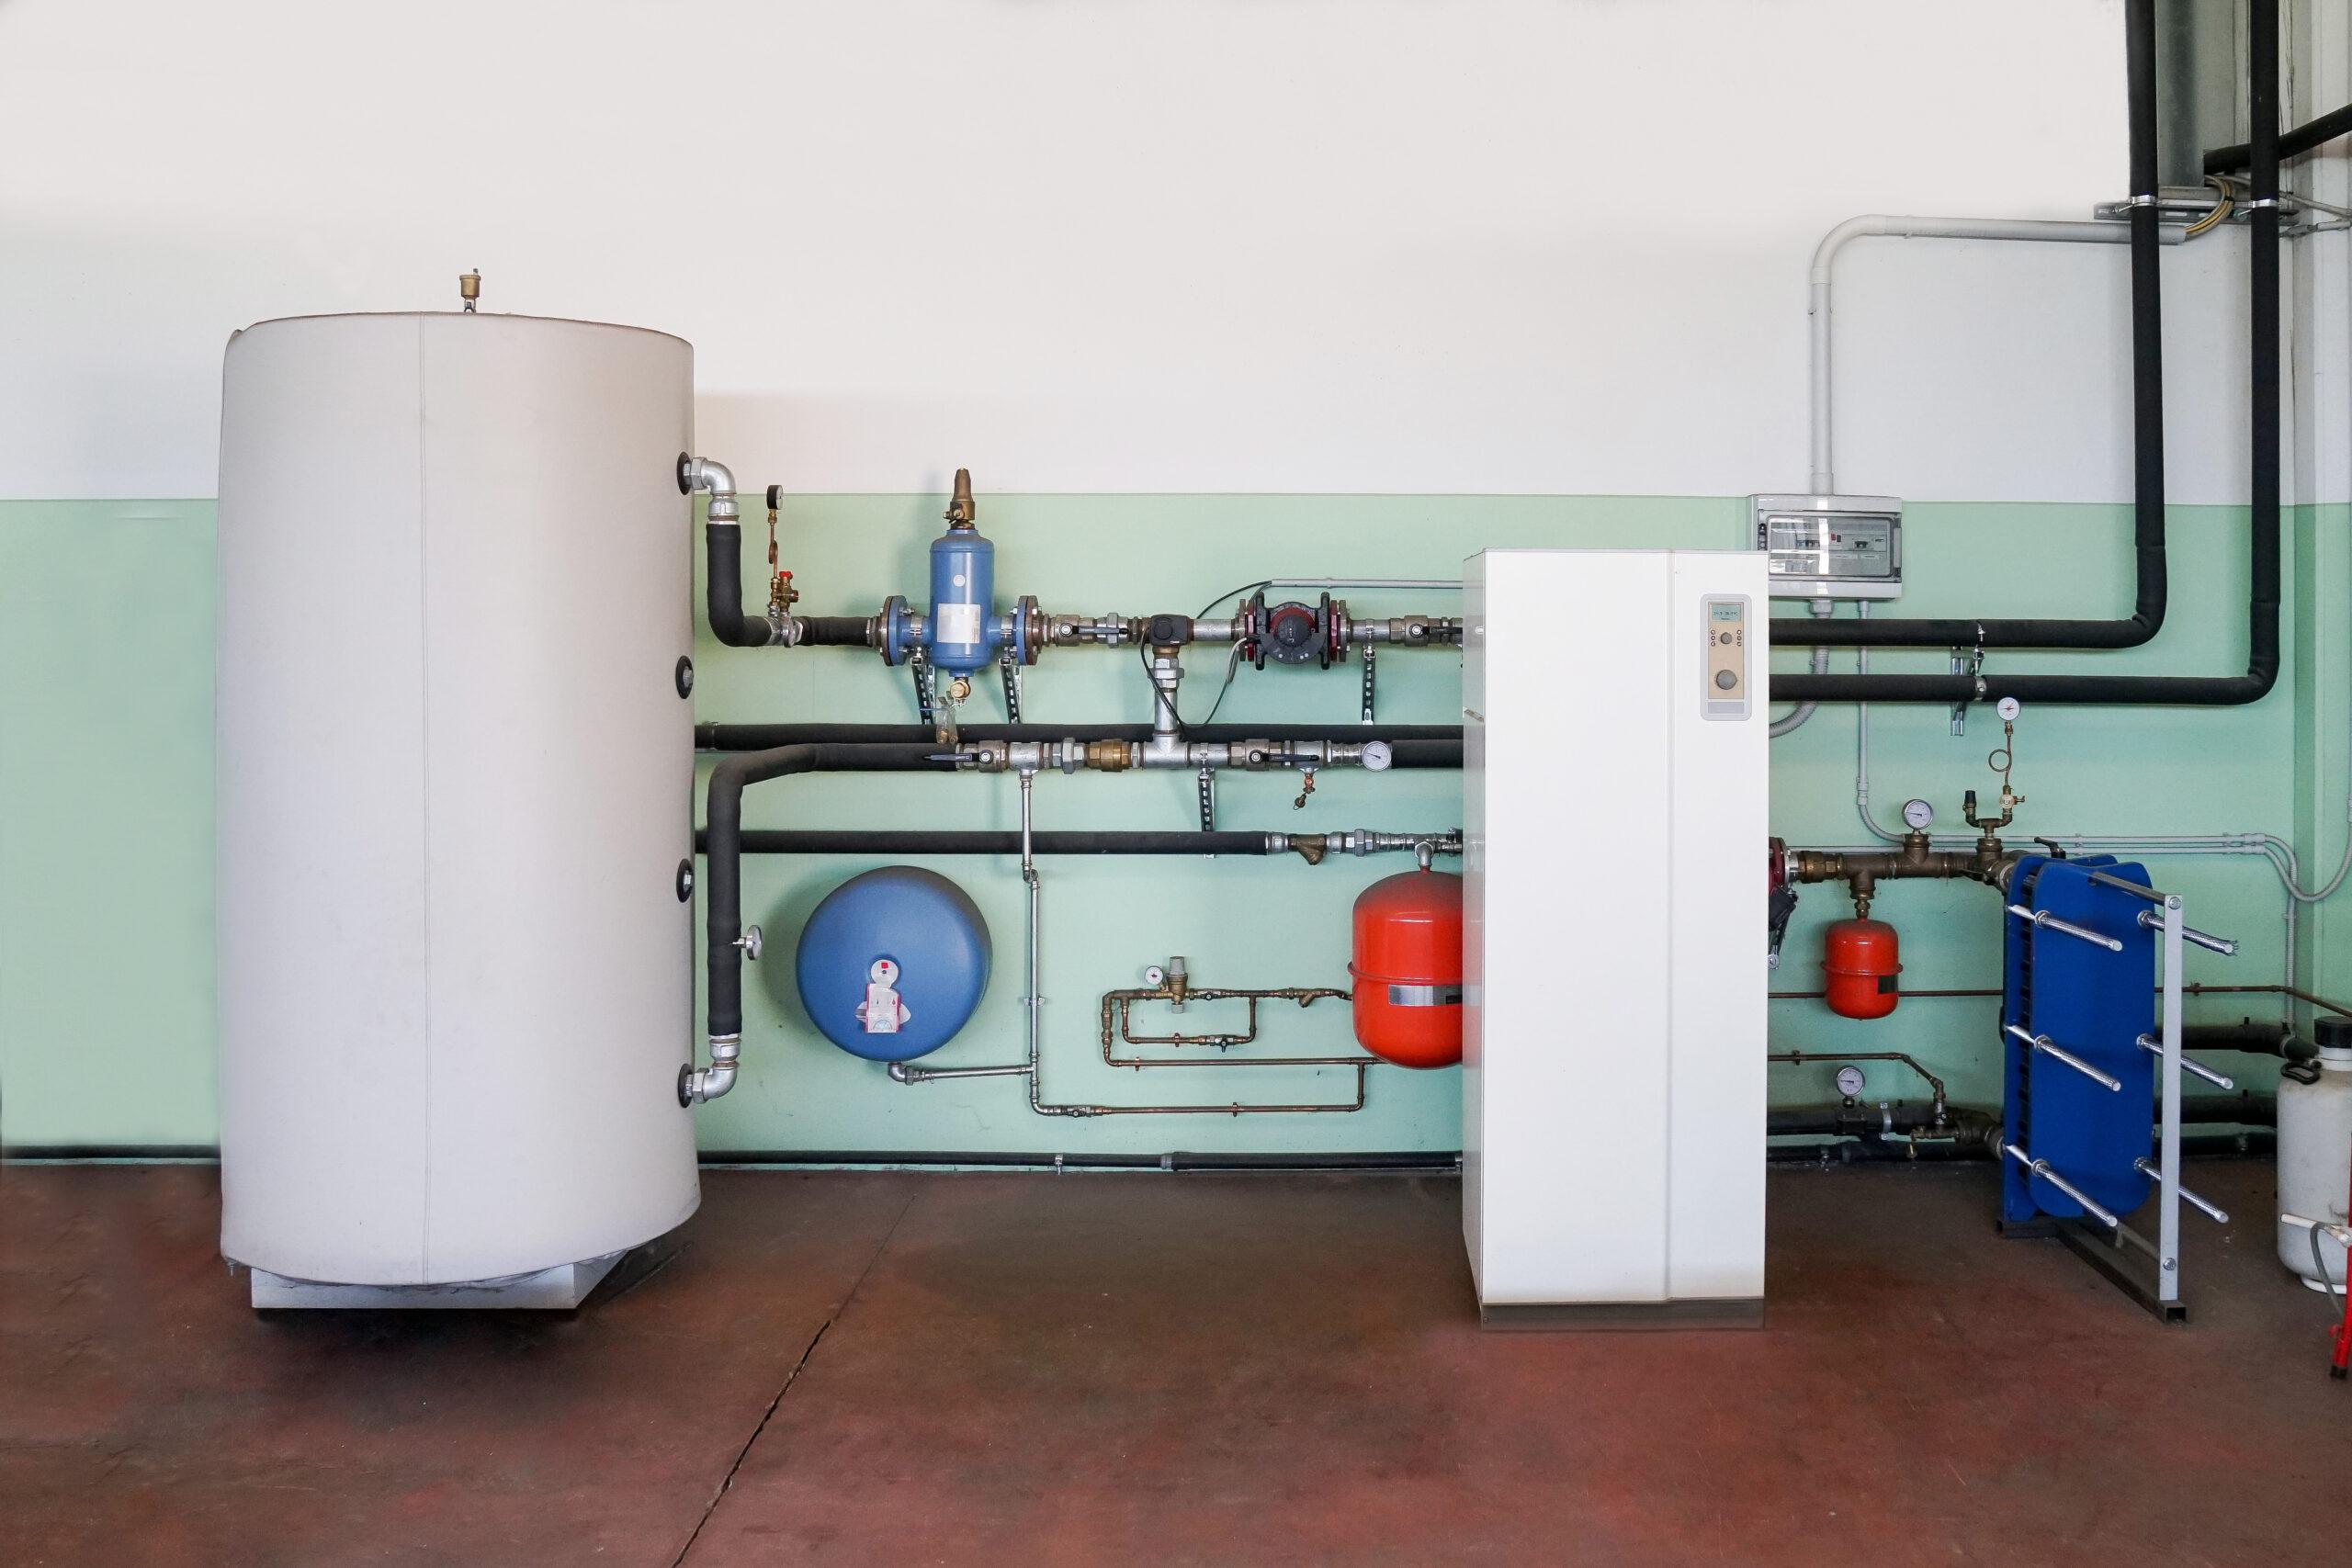 Advantages And Disadvantages Of Heat Pumps